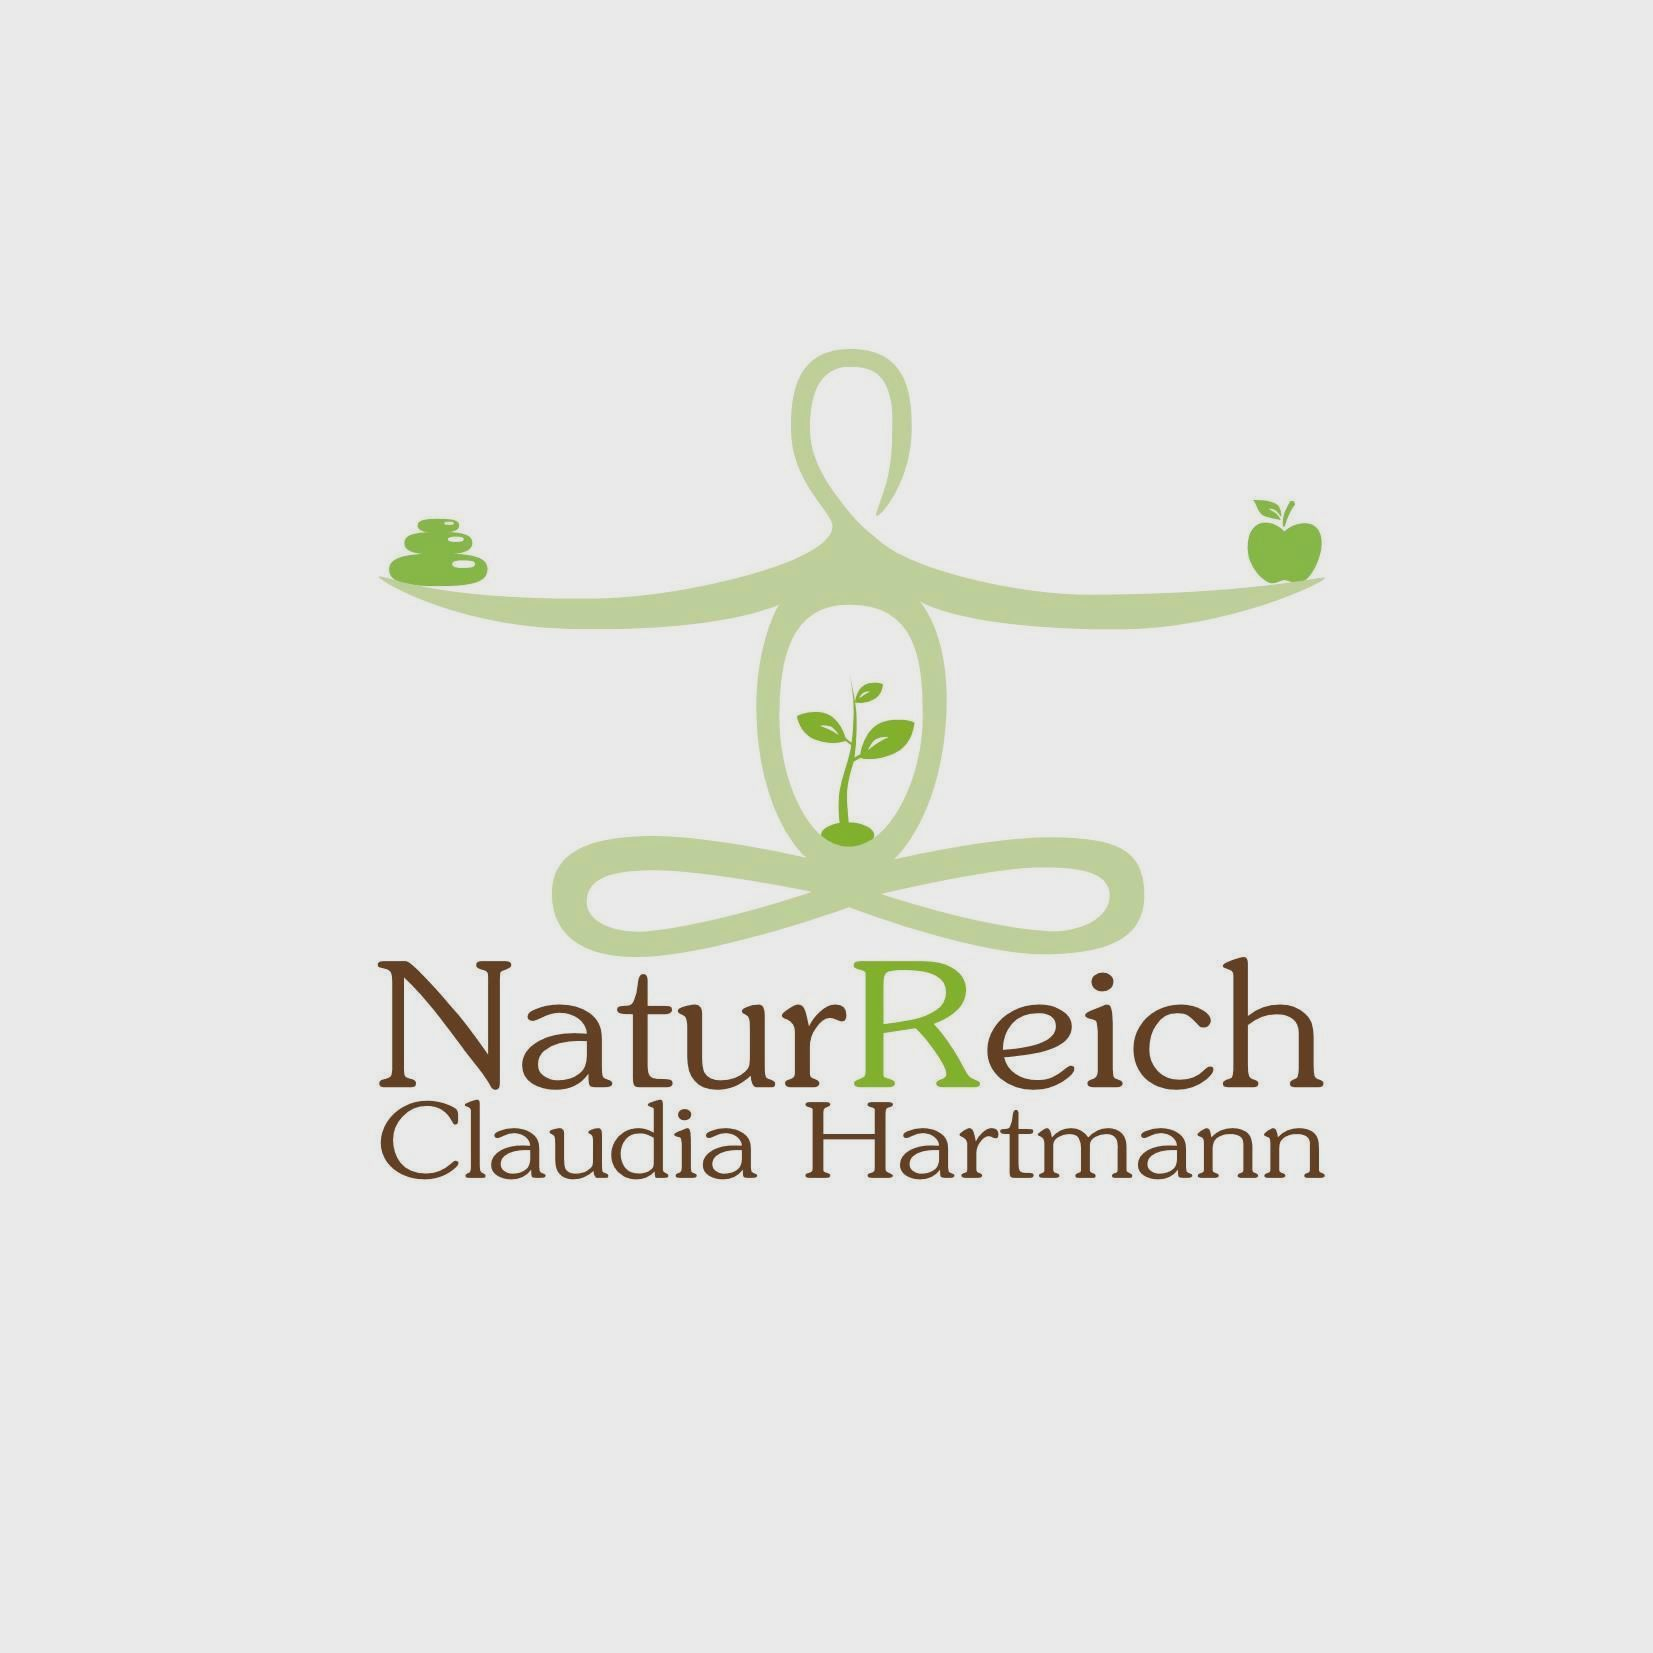 NaturReich Claudia Hartmann